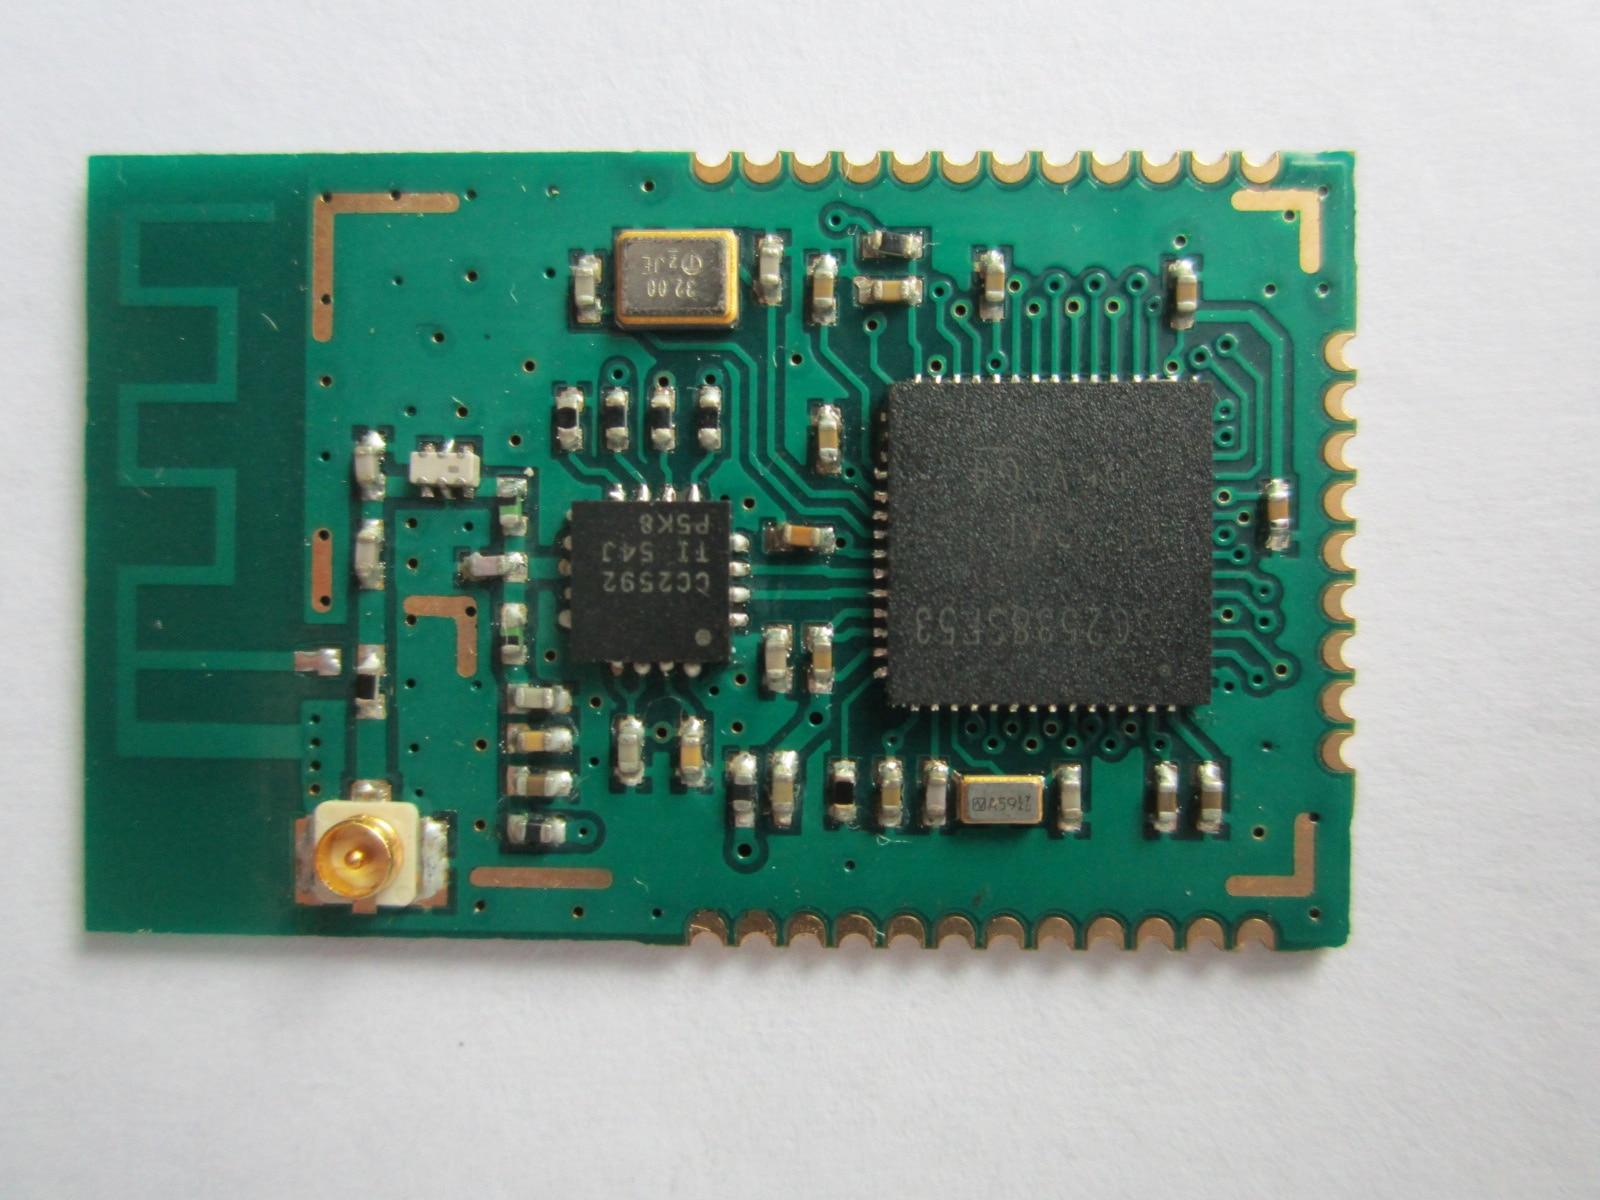 CC2538+CC2592 PA Zigbee Wireless Module zigbee wireless module long distance cc2530 cc2591 pa module